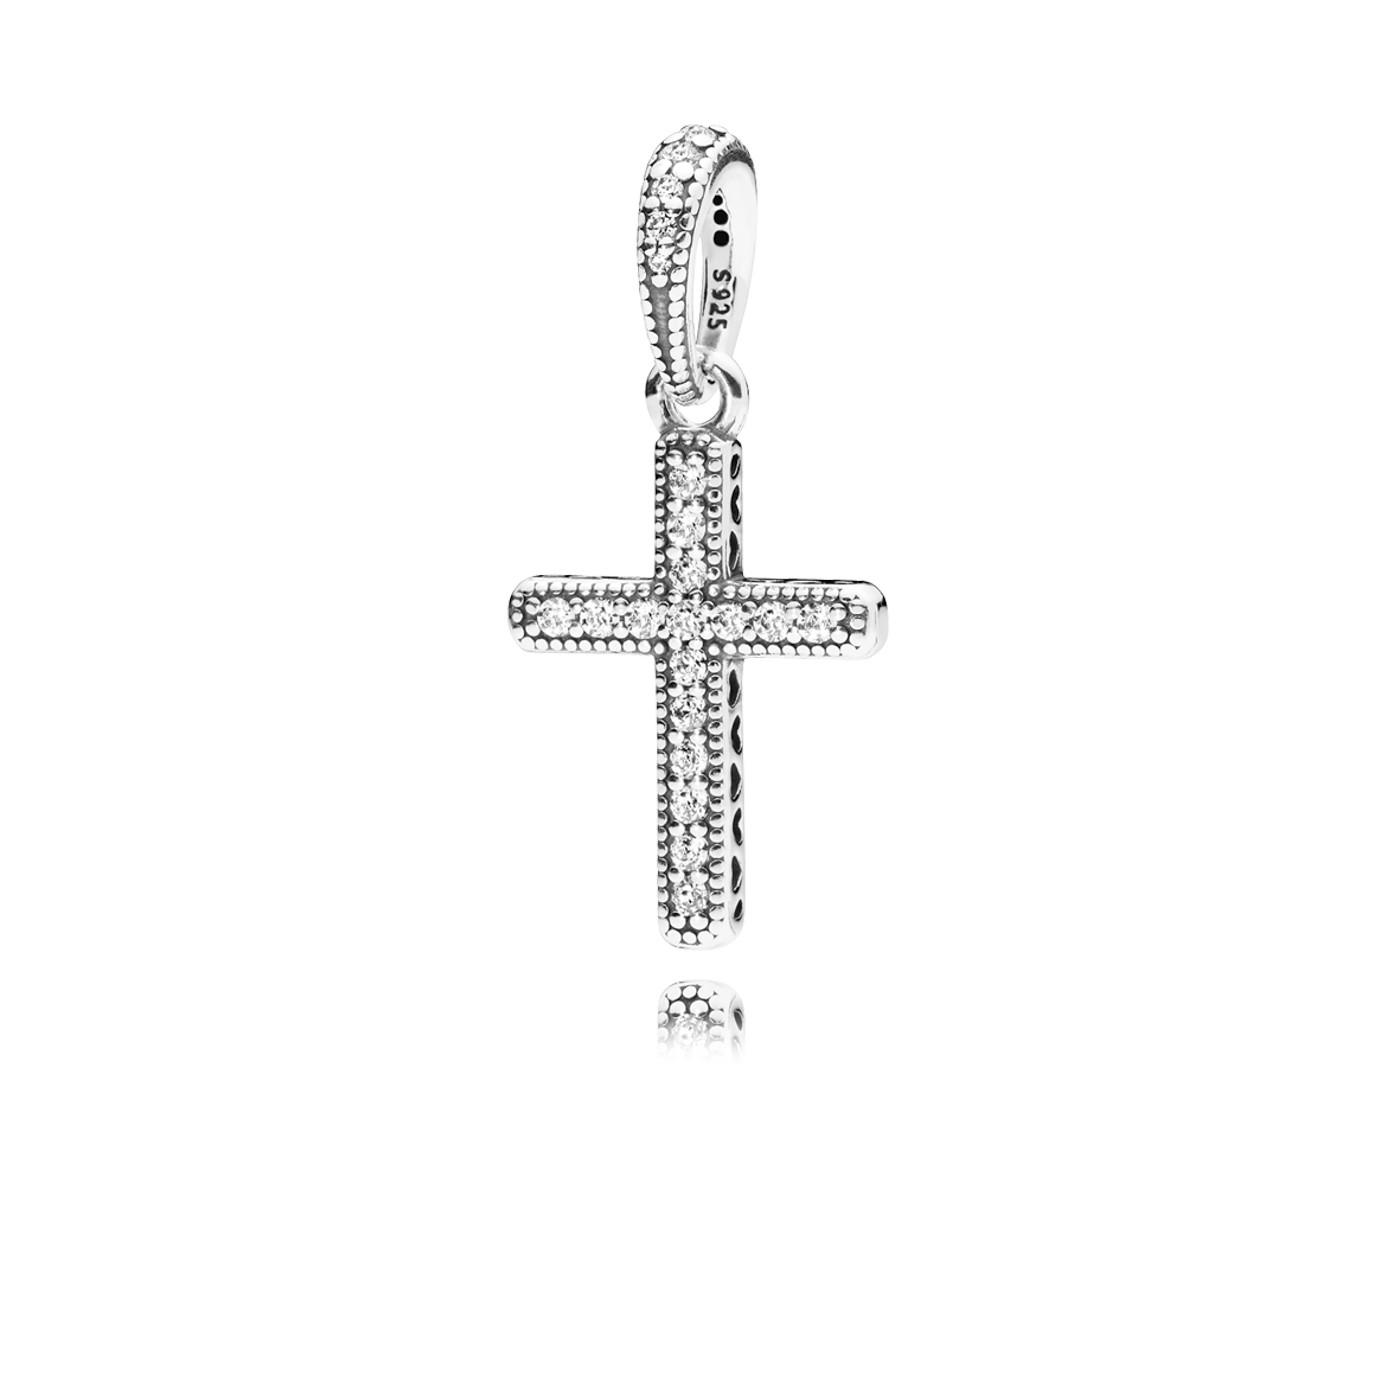 Pandora 925 Sterling Silver Cross Silver pendant en Necklace 397571CZ